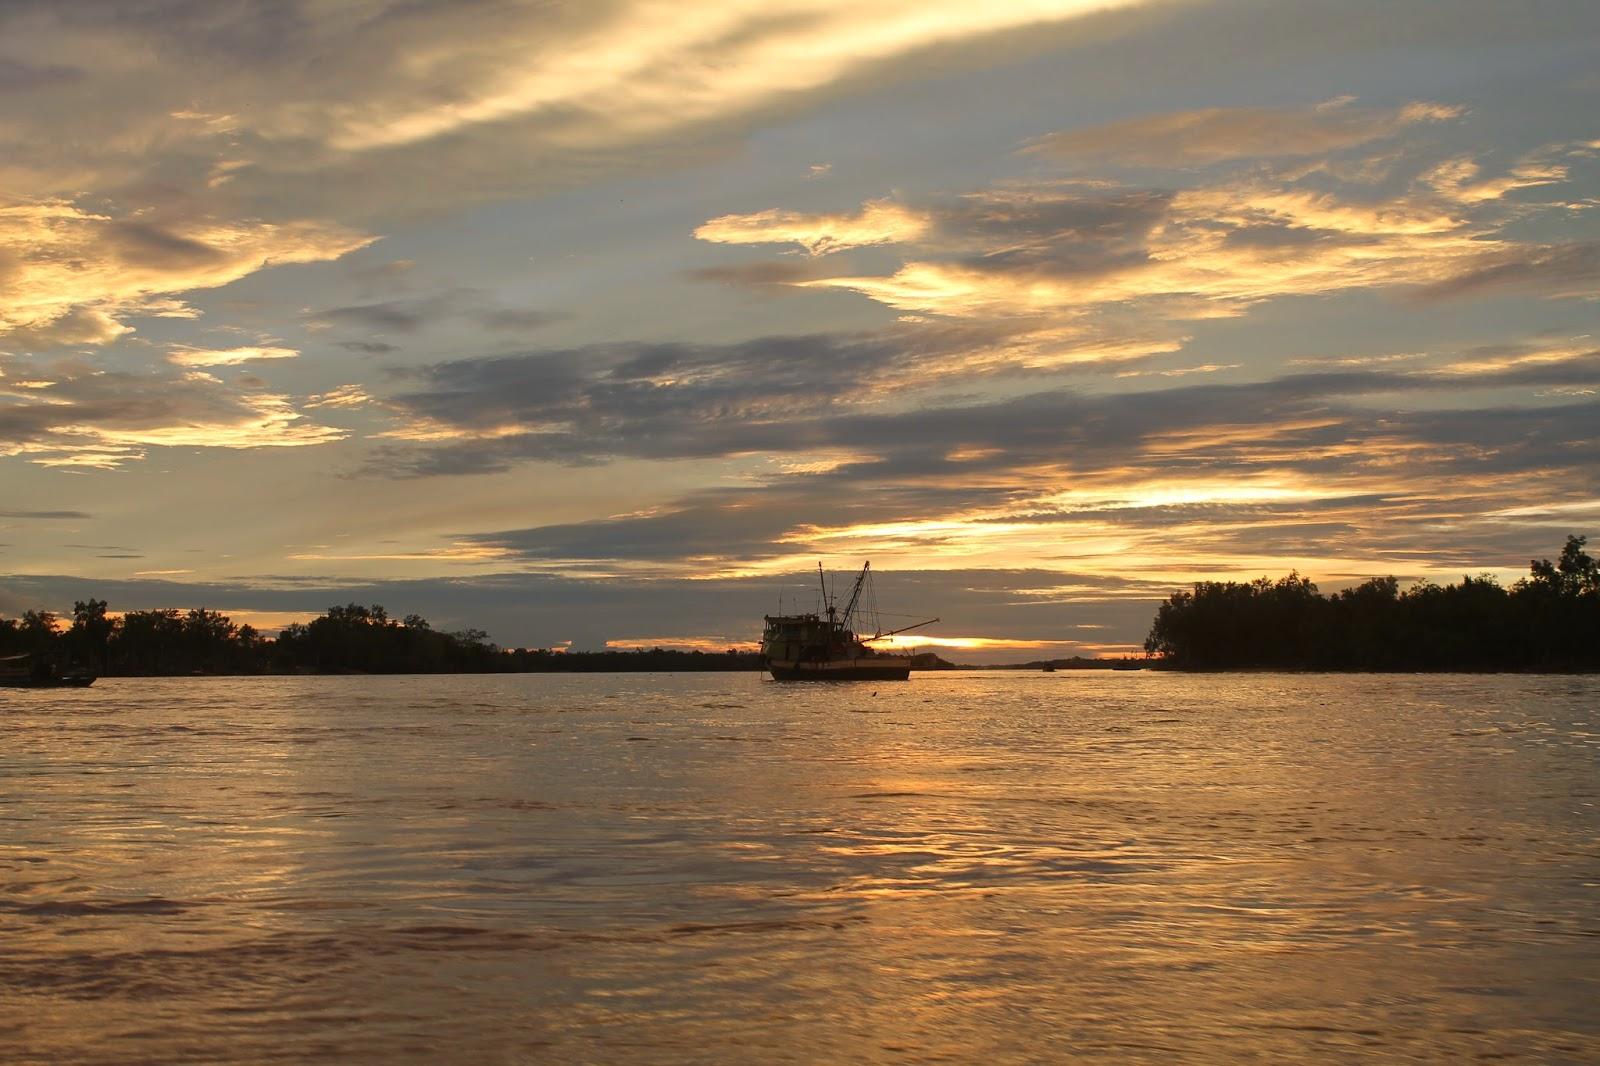 Pemandangan Senja Keemasan Yang Indah Di Kampung Pusabetong Sarawak